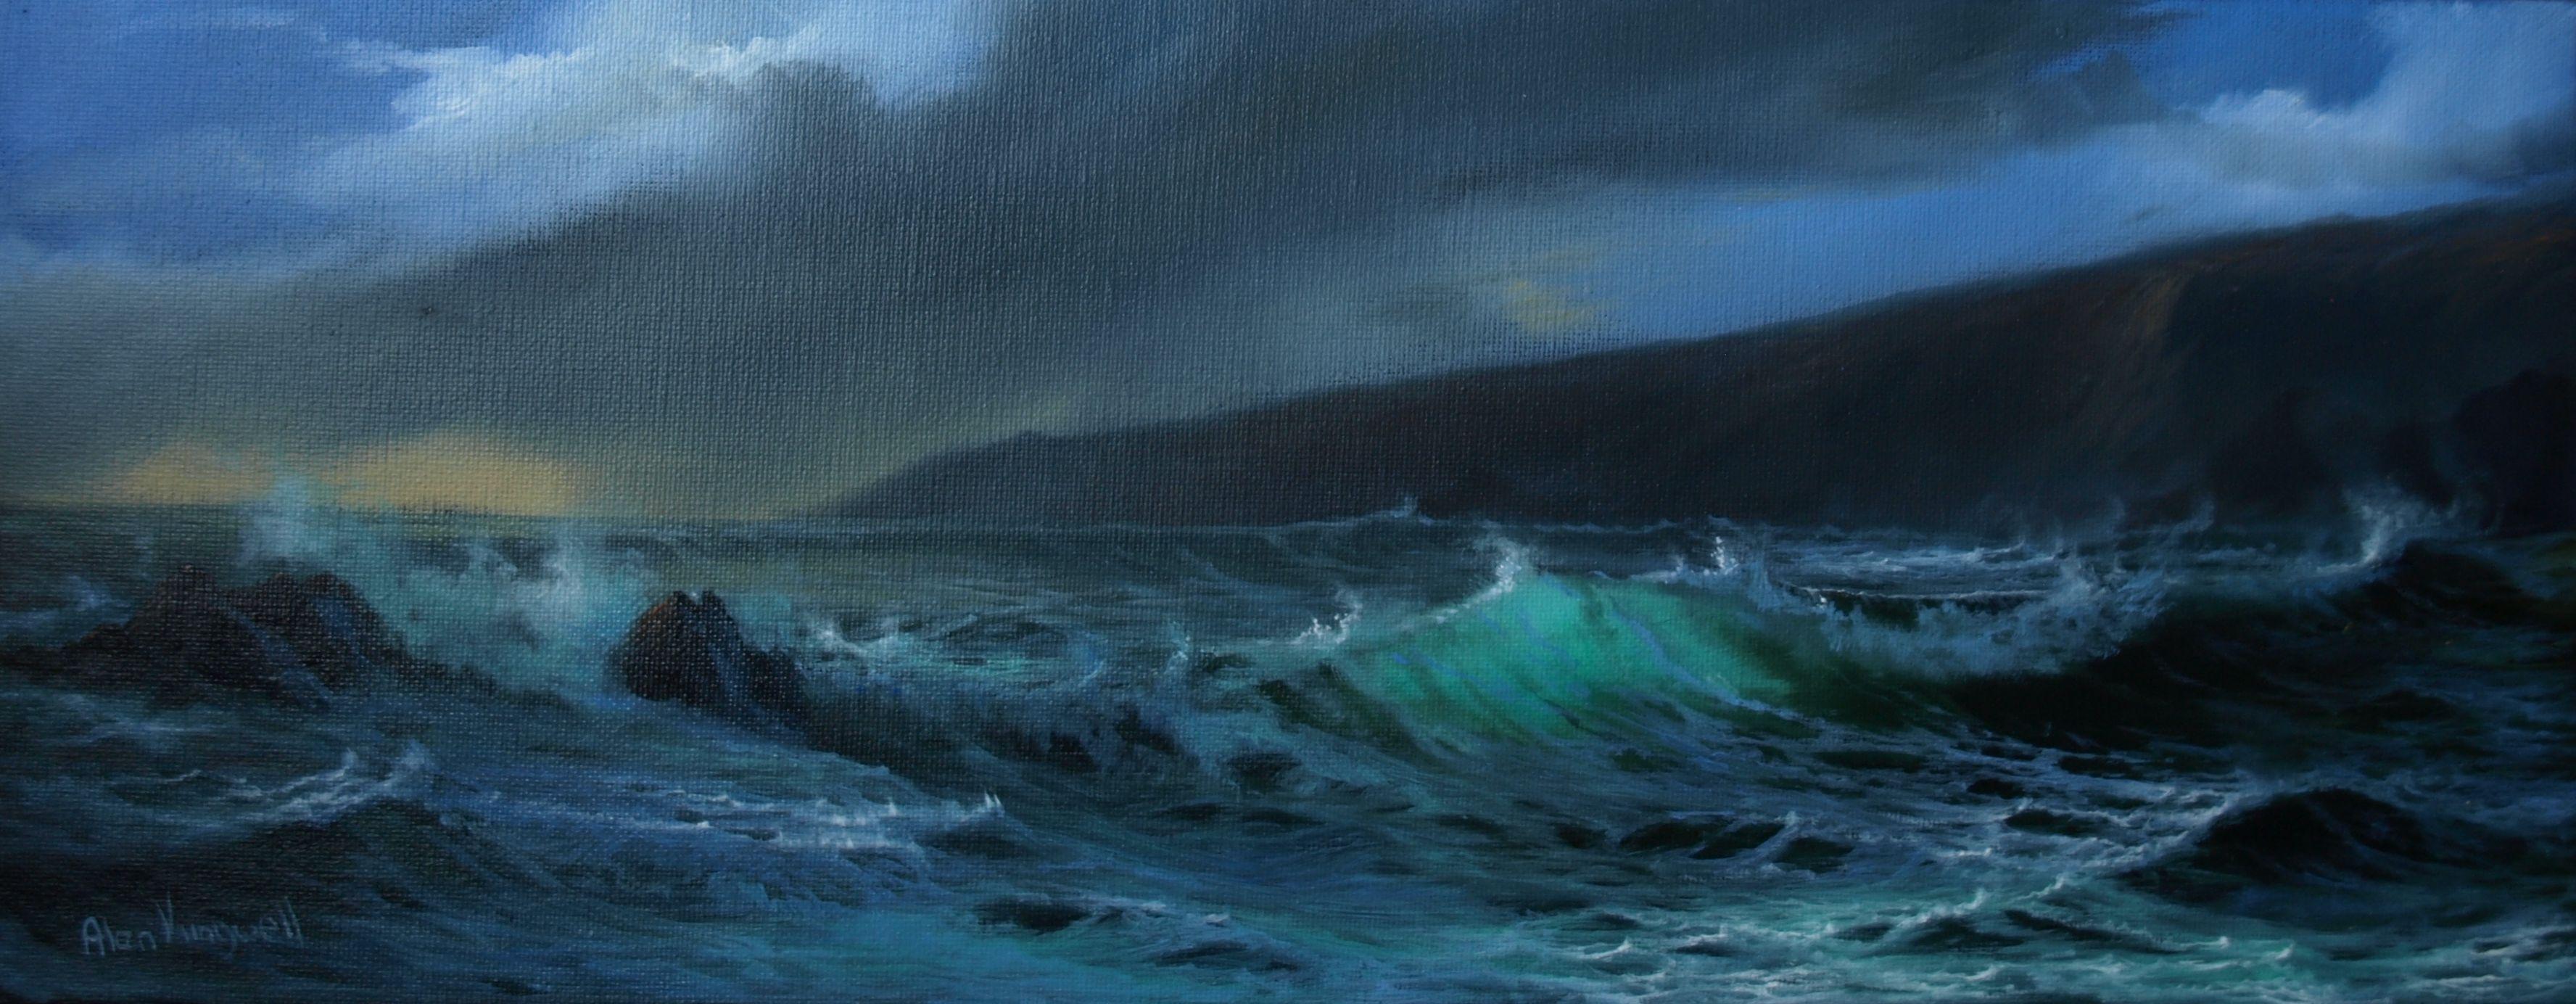 Alan King Oil Paintings Value